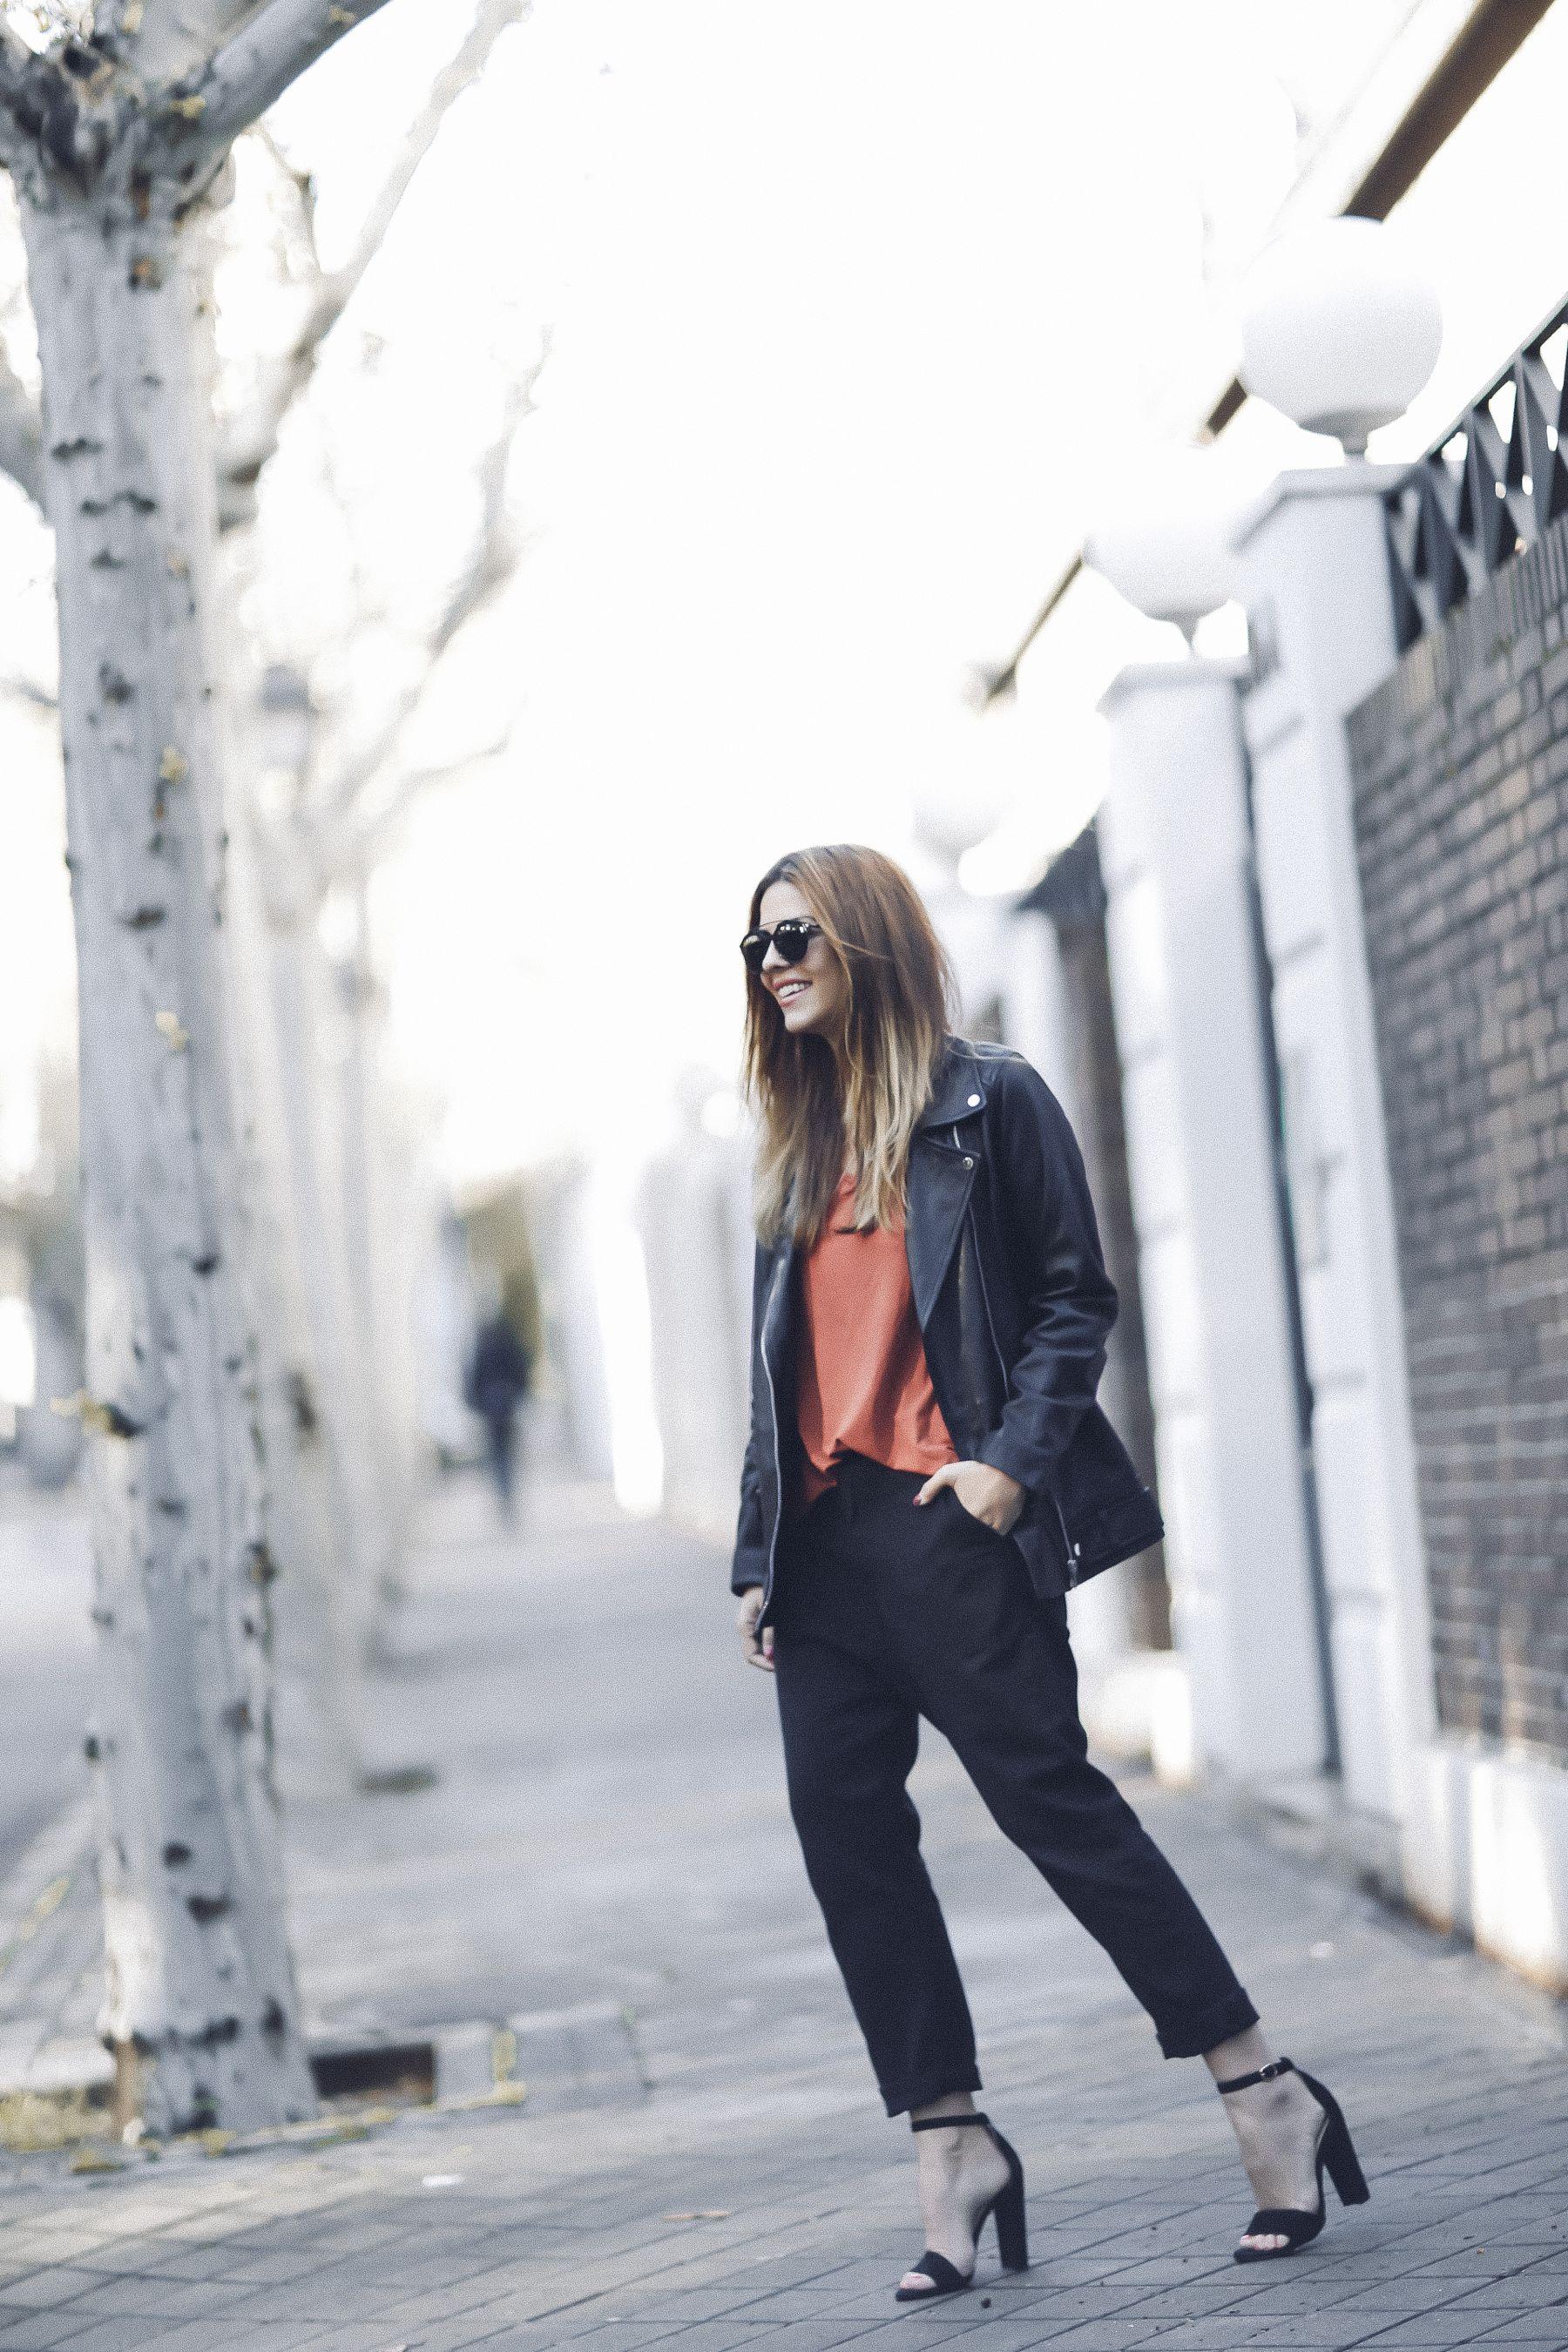 sandalias sandals mbym outfit look primavera spring camiseta zara steve madden Dior gafas de sol sunglasses street style trendy taste_9